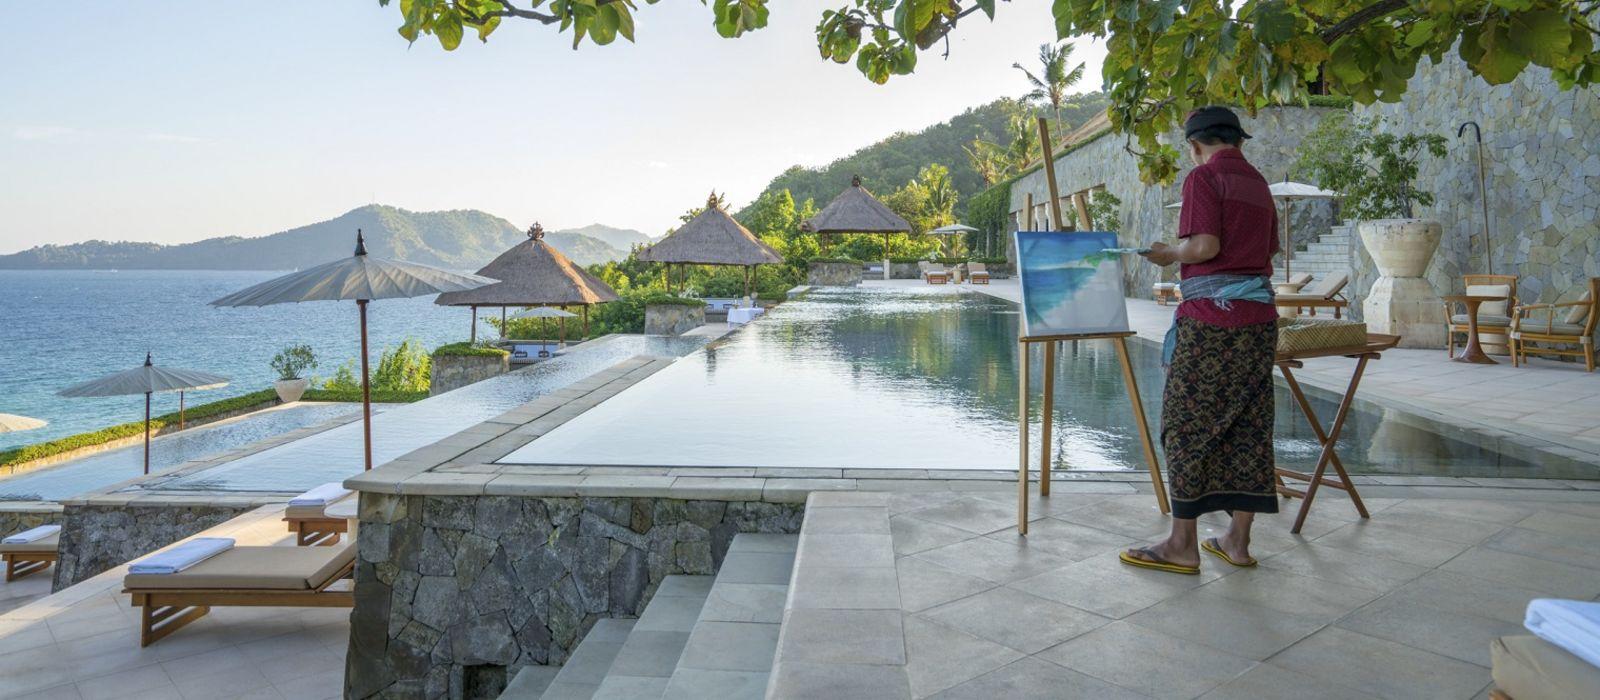 Bali Holidays: Top 10 Luxury Pools